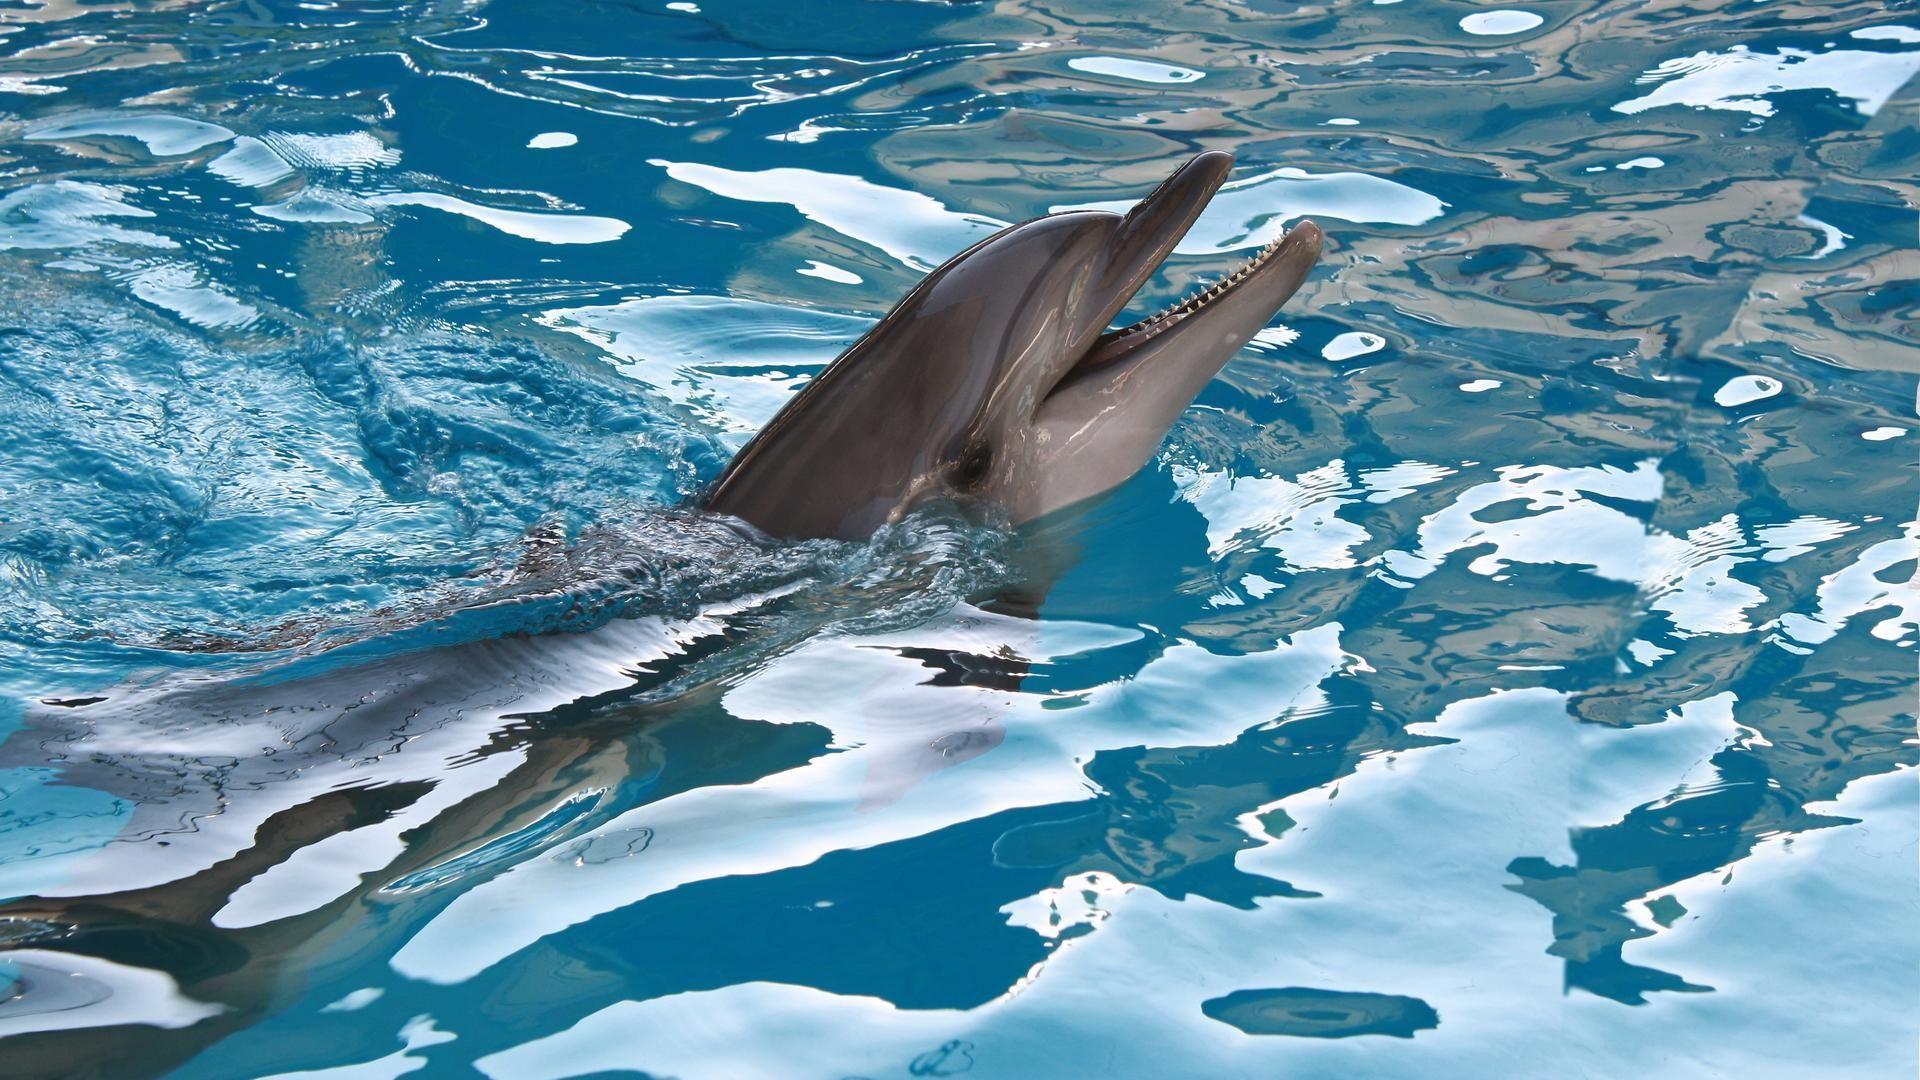 Wallpaper For Desktop Dolphins